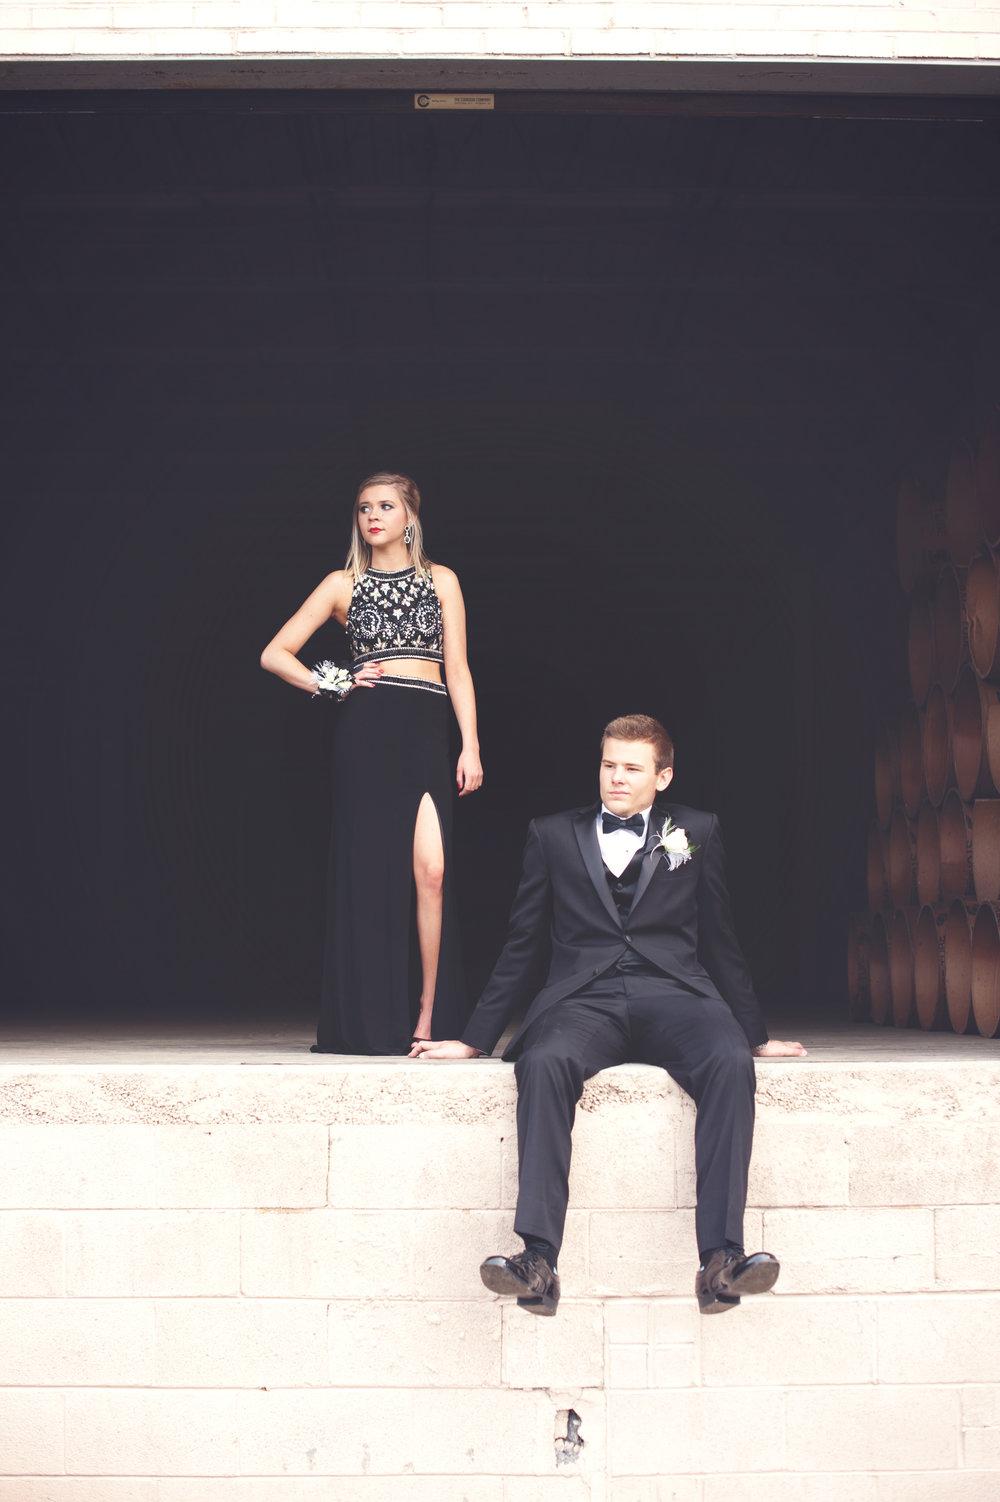 causby prom 0418 2015-65.jpg